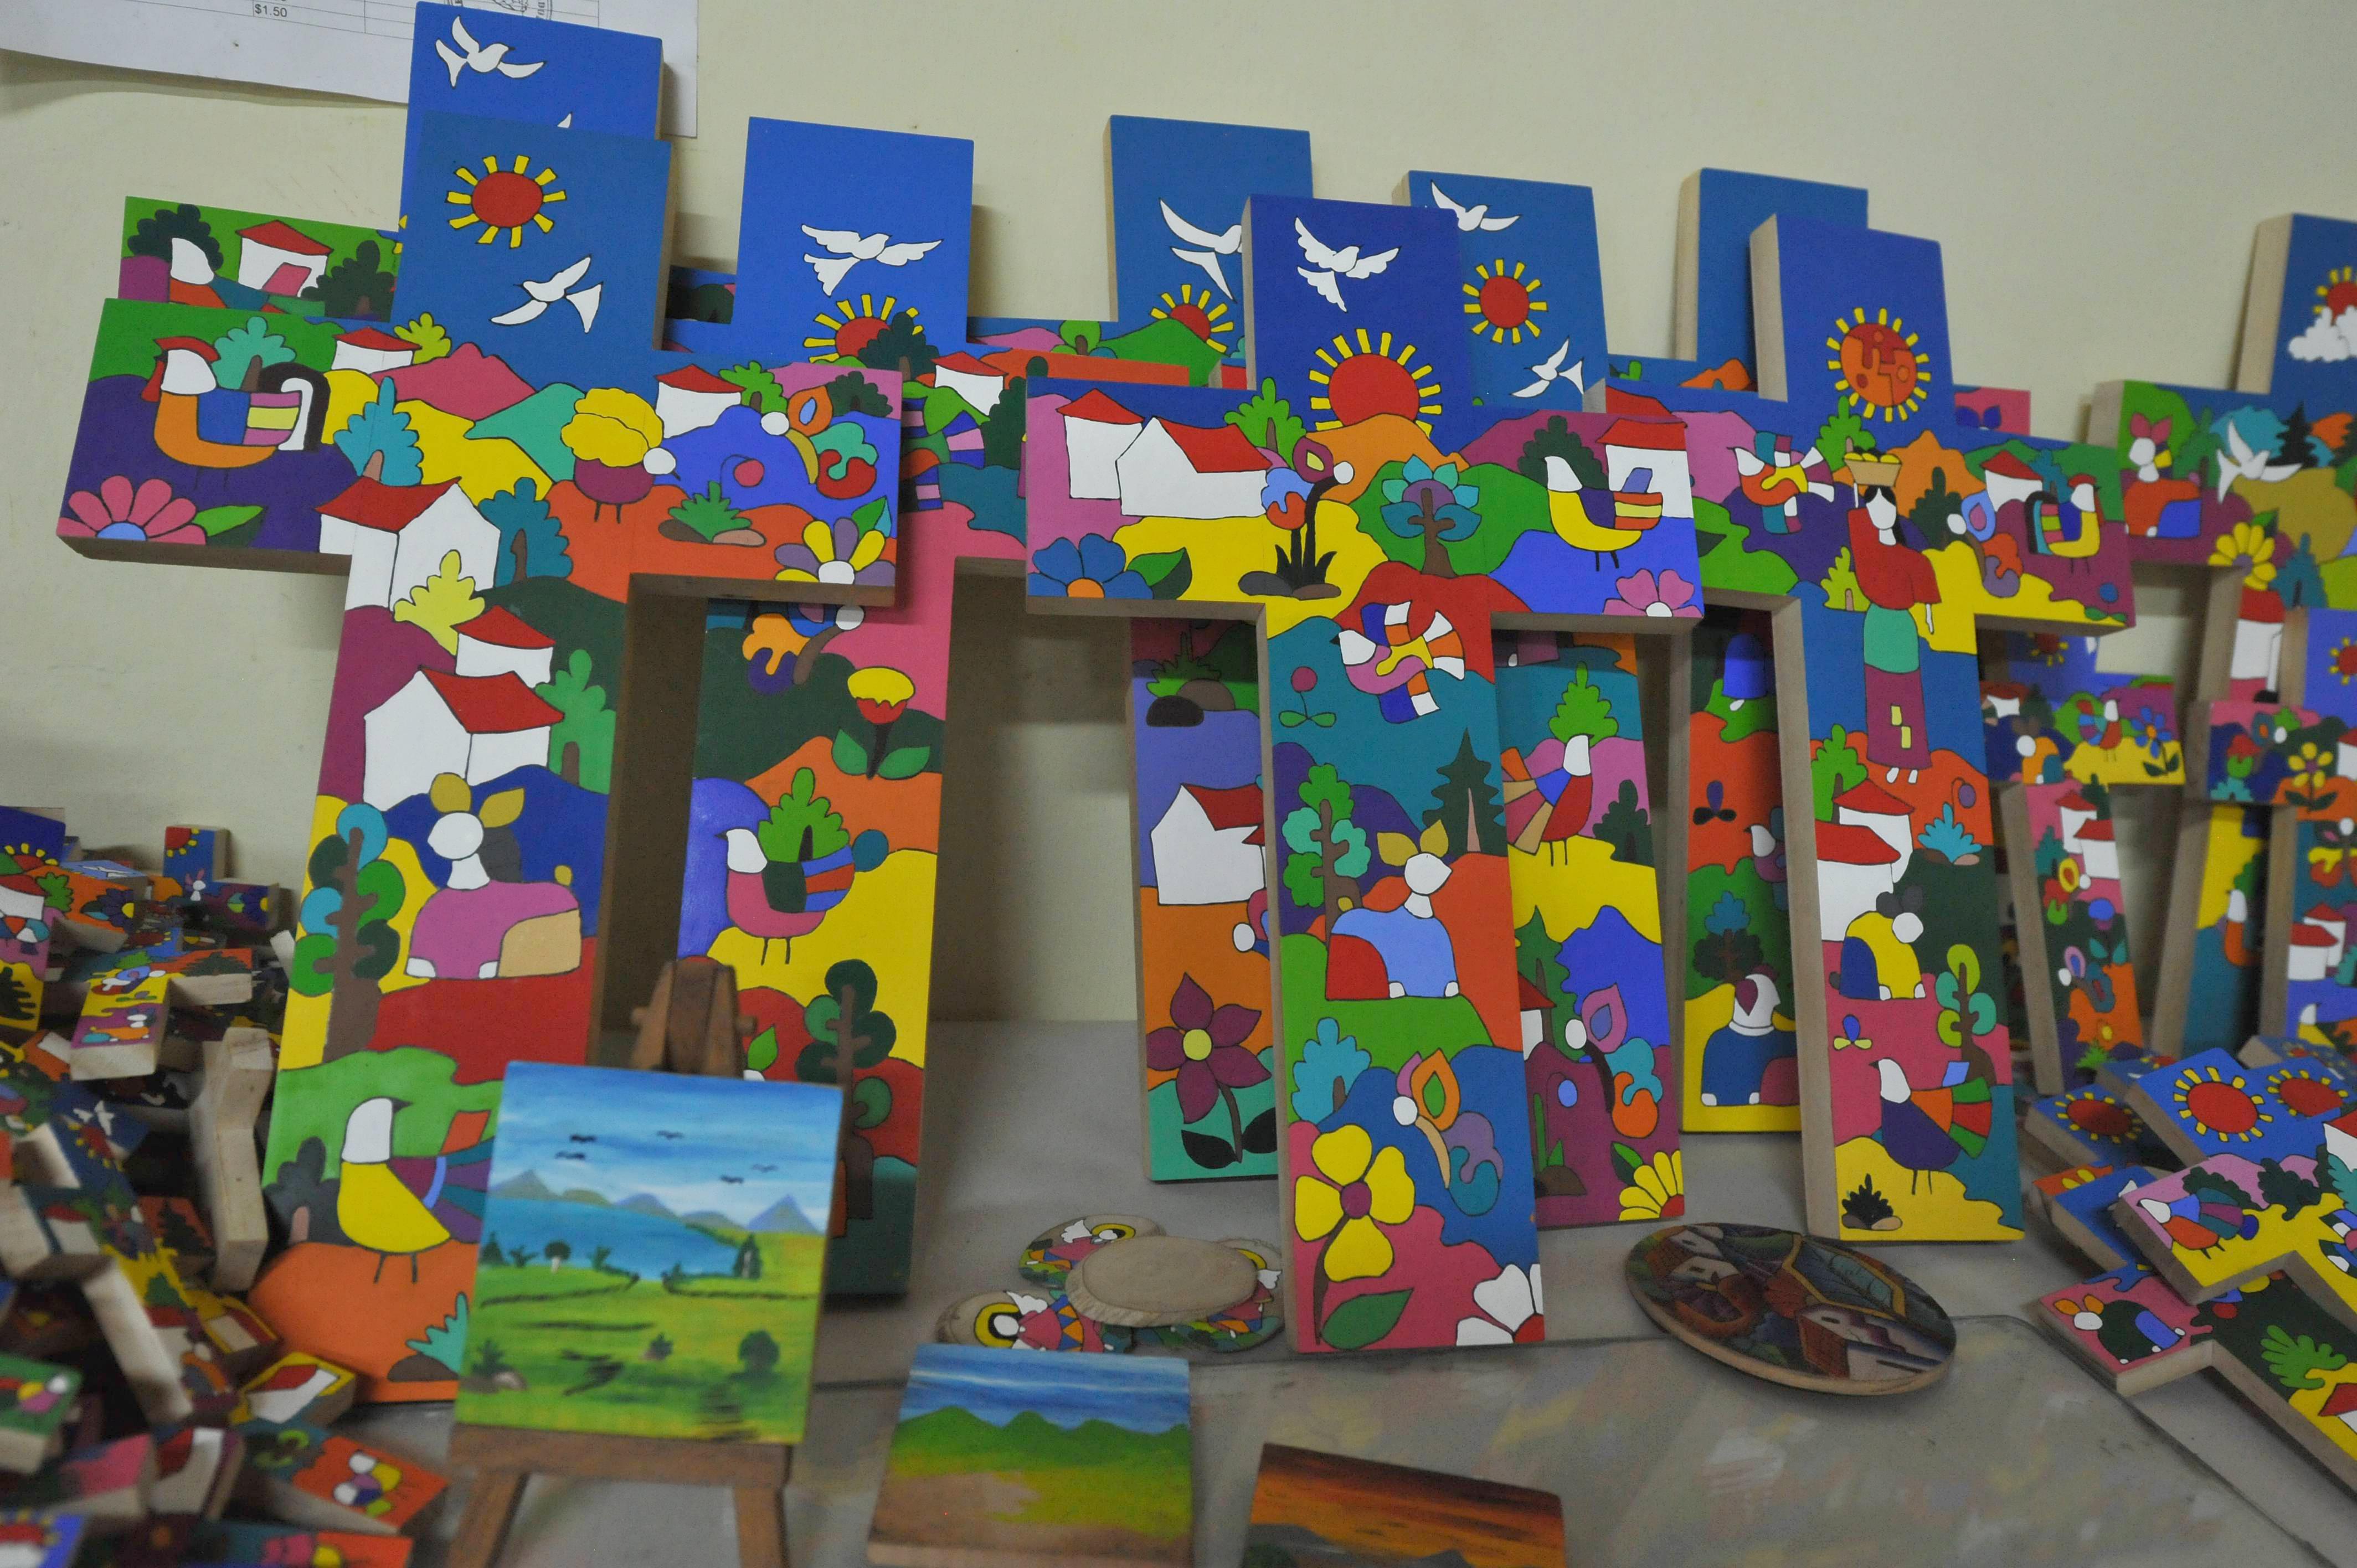 web-painting-christian-chavarrian-ayala-crosses-lwf-c-ka%cc%88stner